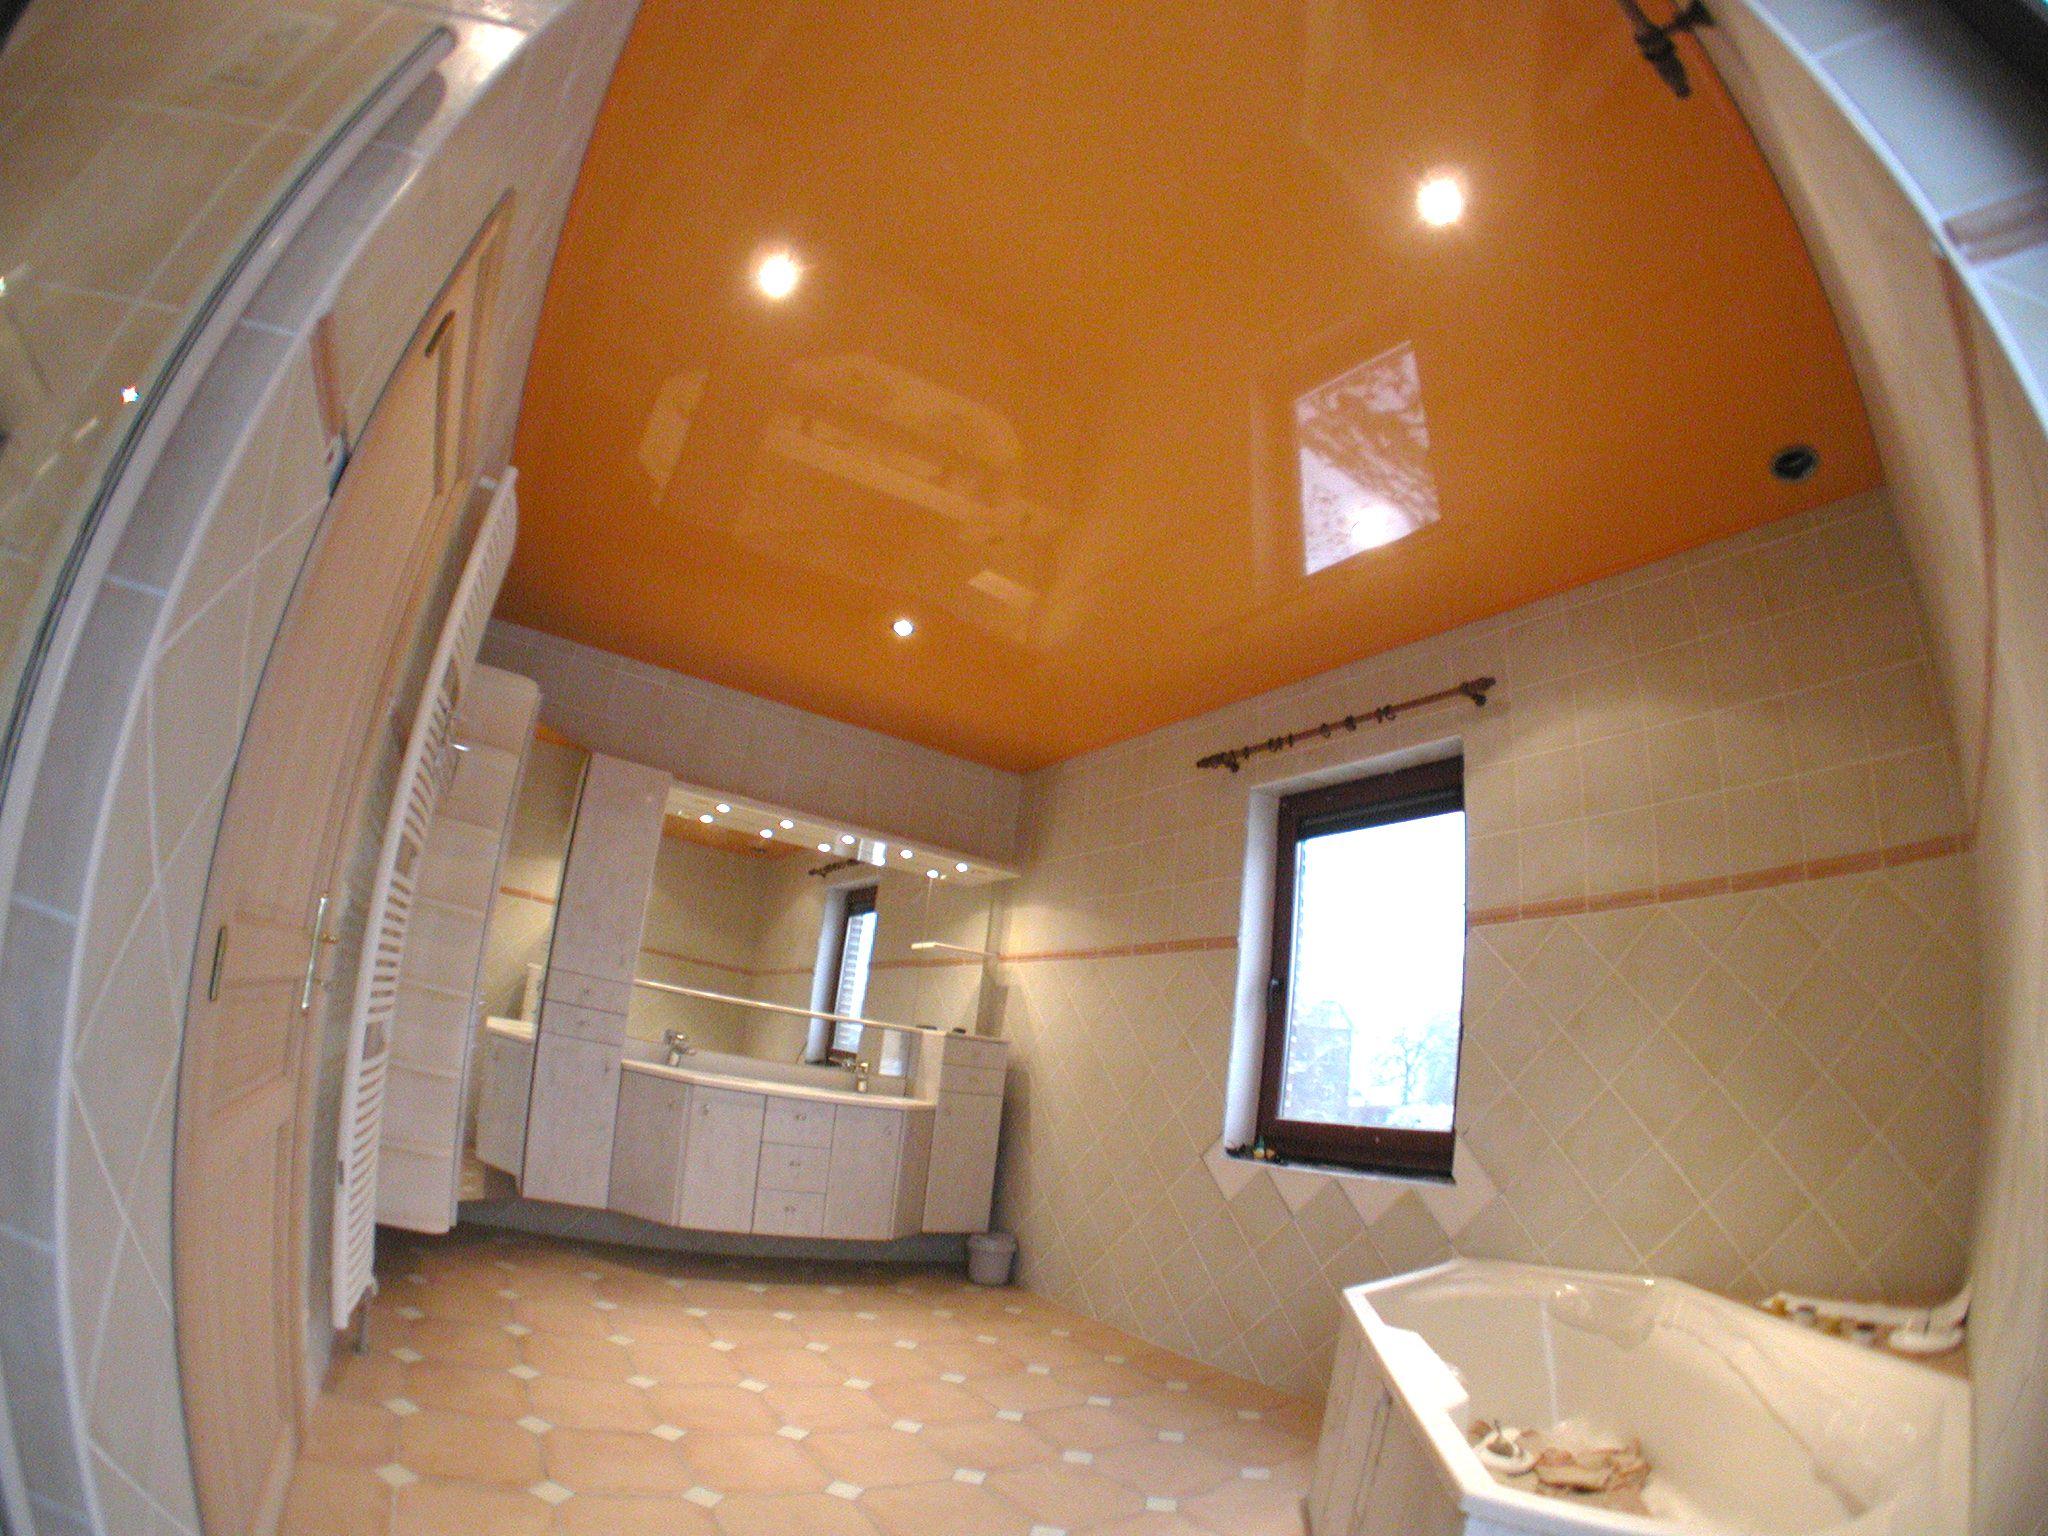 Stretch Ceiling- Plafond tendu dans une salle de bain - Spanplafond ...